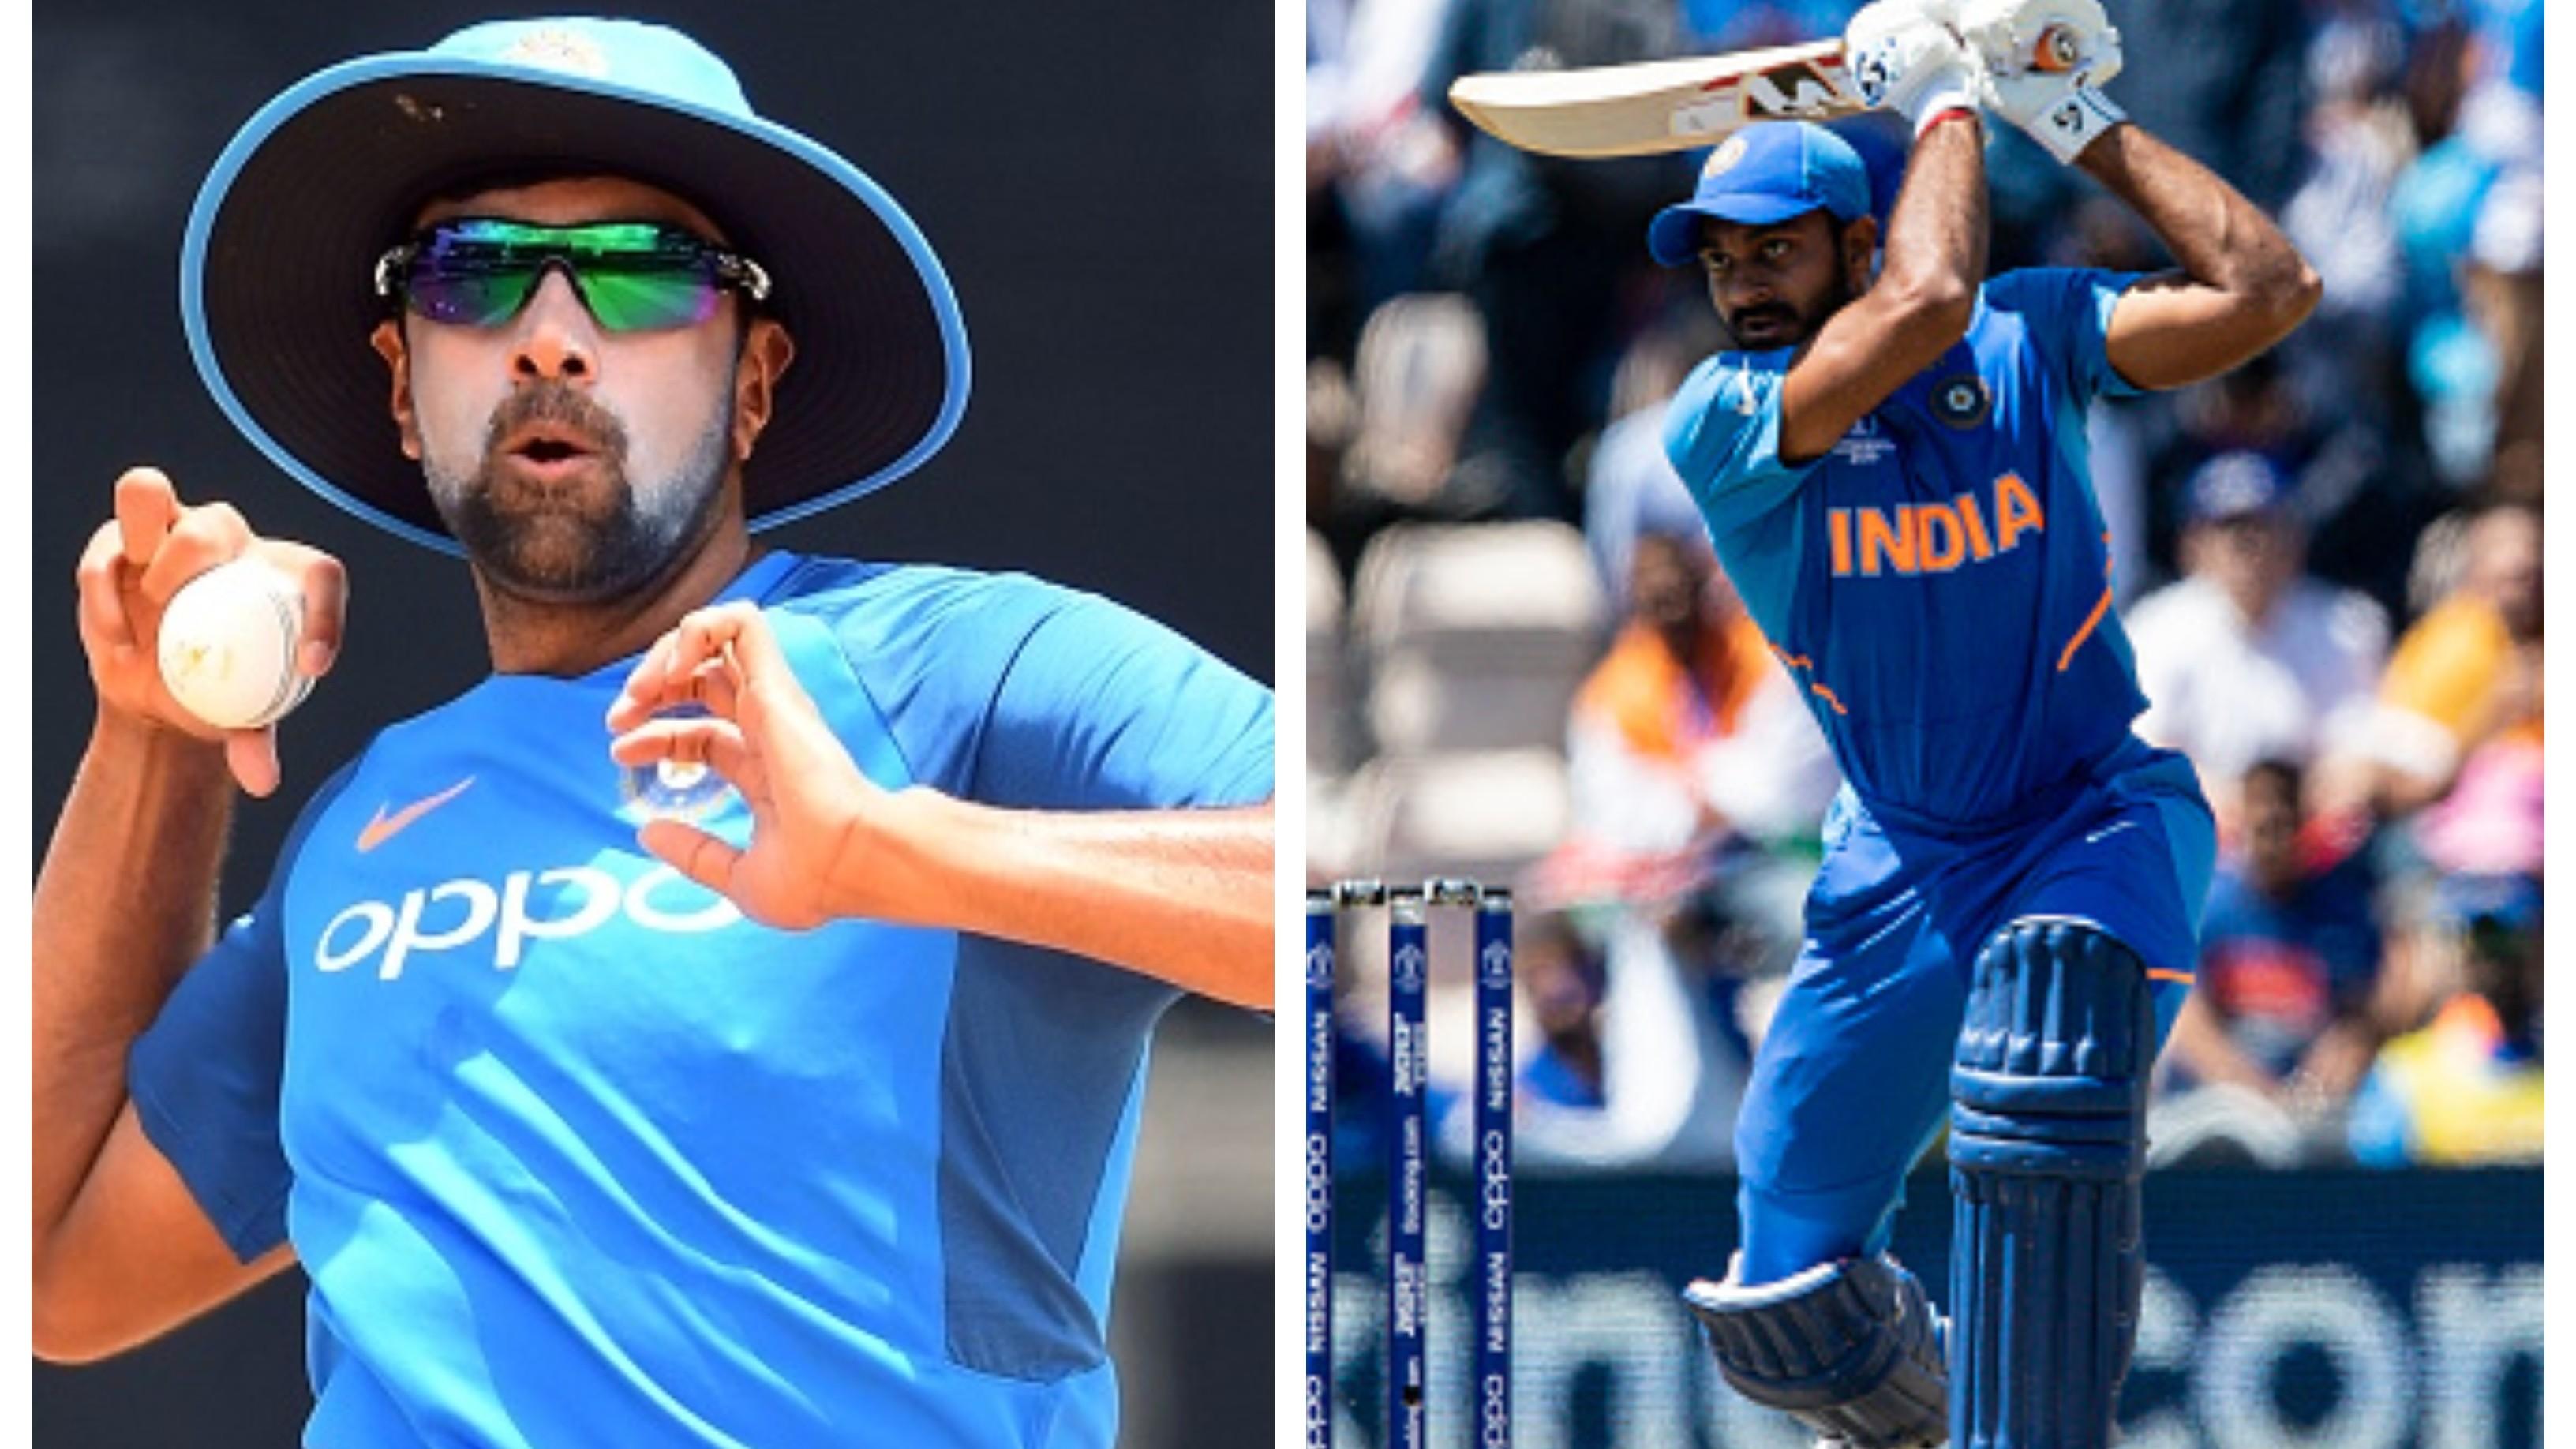 Tamil Nadu picks R Ashwin, Vijay Shankar in probables list for Vijay Hazare Trophy